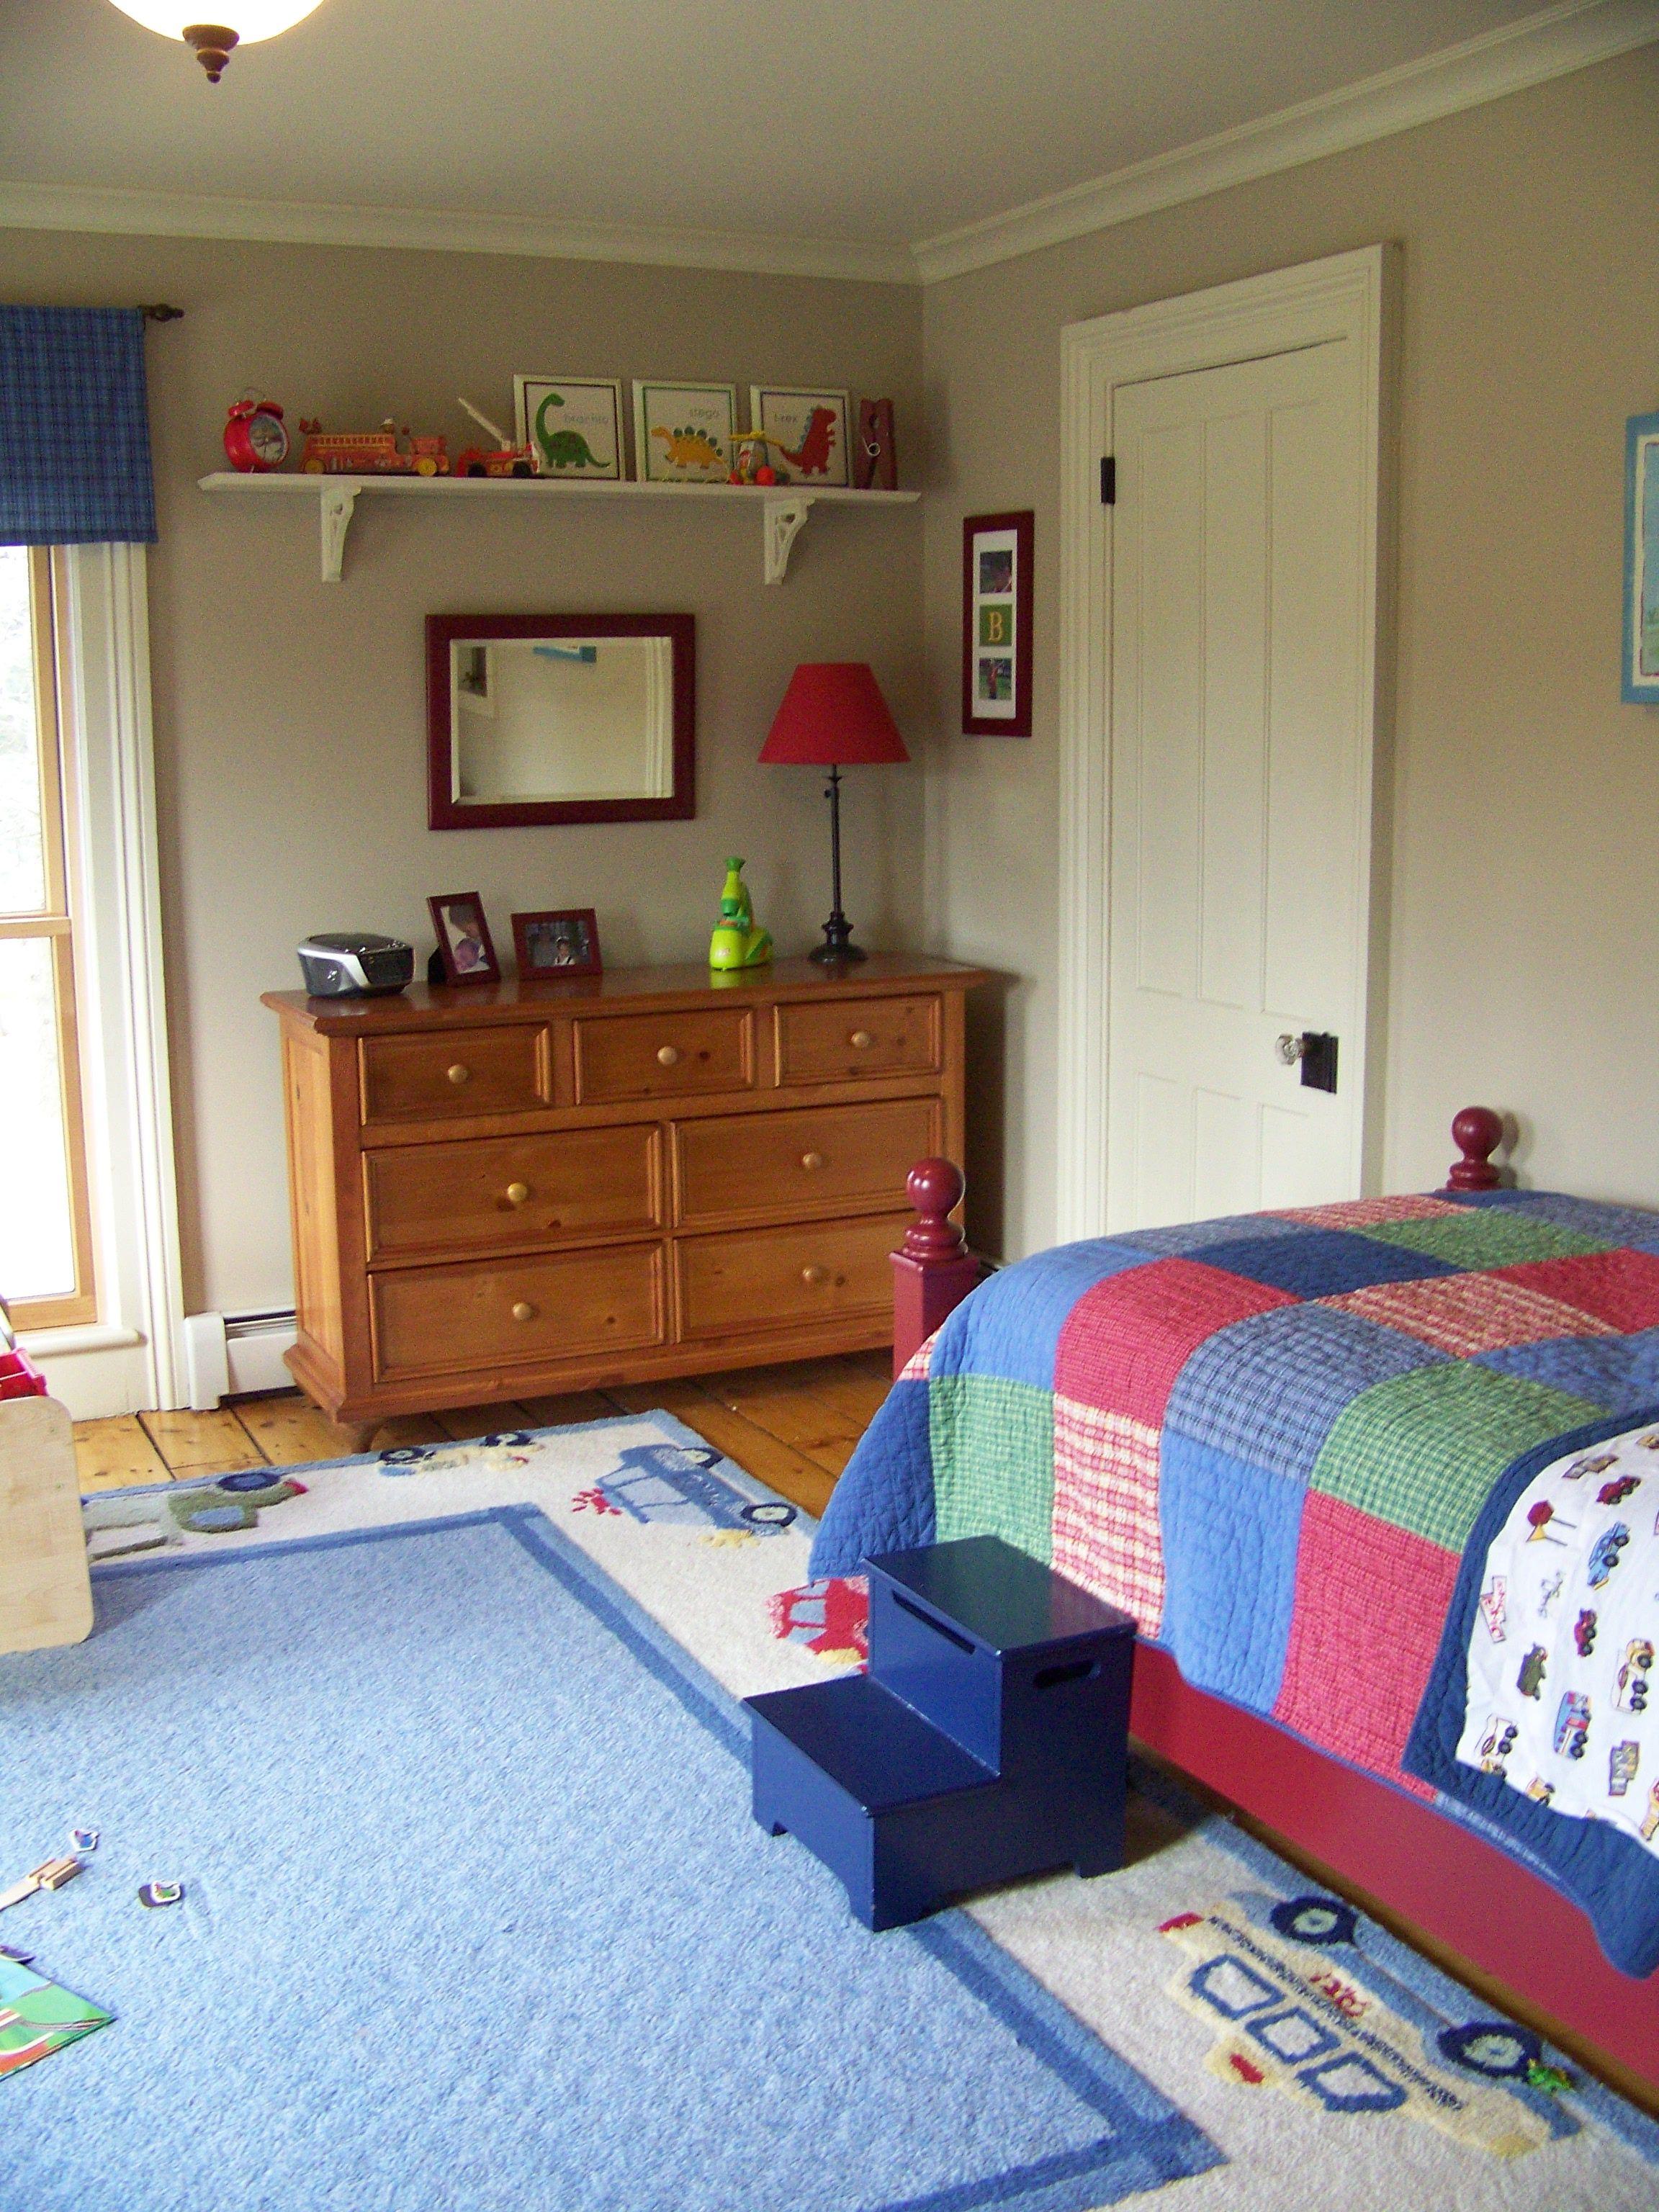 enjoyable bedroom interior design. Minimalist Bedroom Interior Design with Colorful bed and Wooden Vanity  Drawers also Wall Mounted Shelves